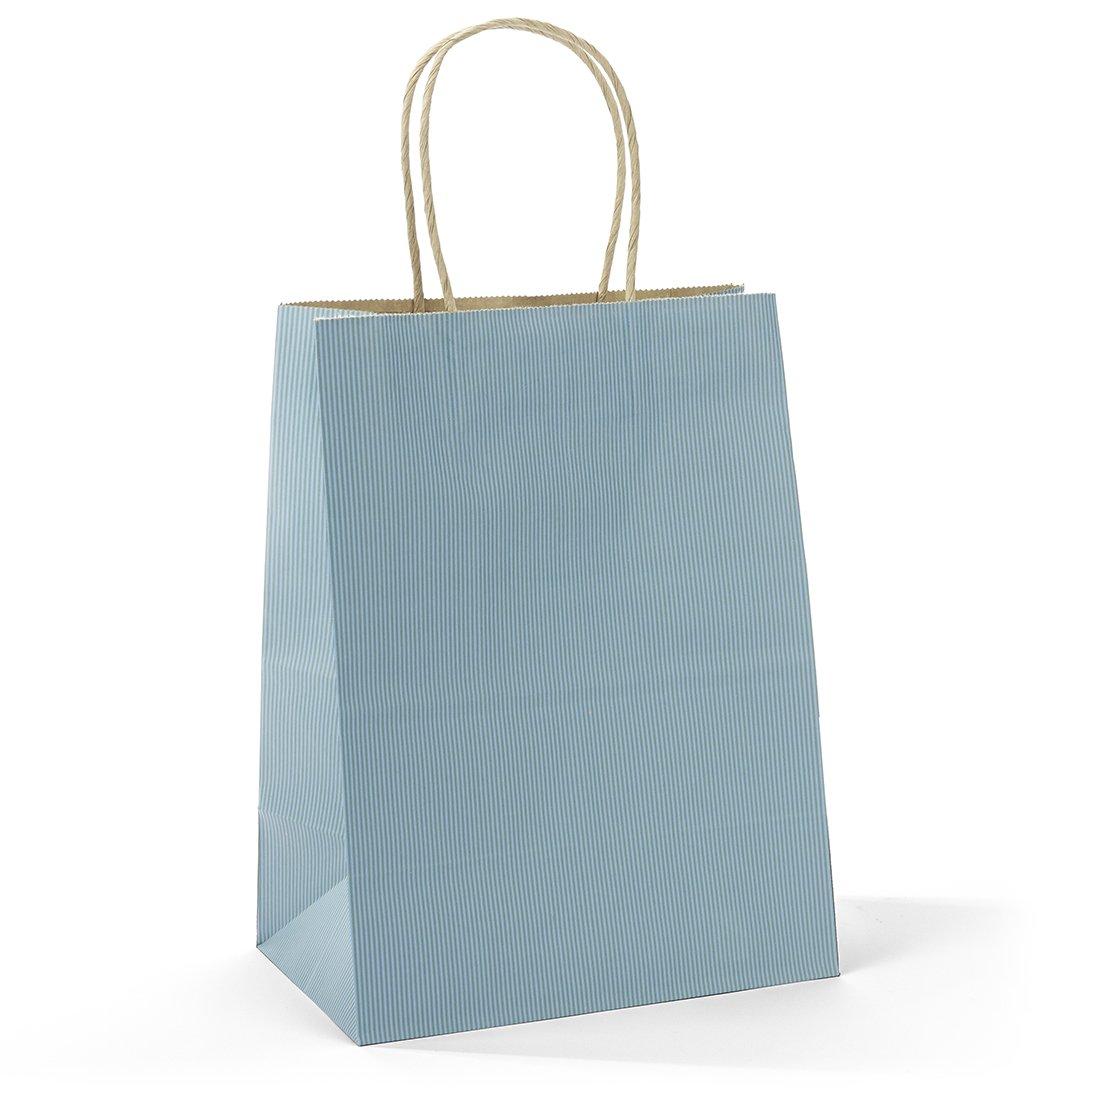 Halulu 50 Pcs 8x4.75x10.5 Kraft Paper Handle Shopping Gift Merchandise Carry Retail Bags (Wisteria)